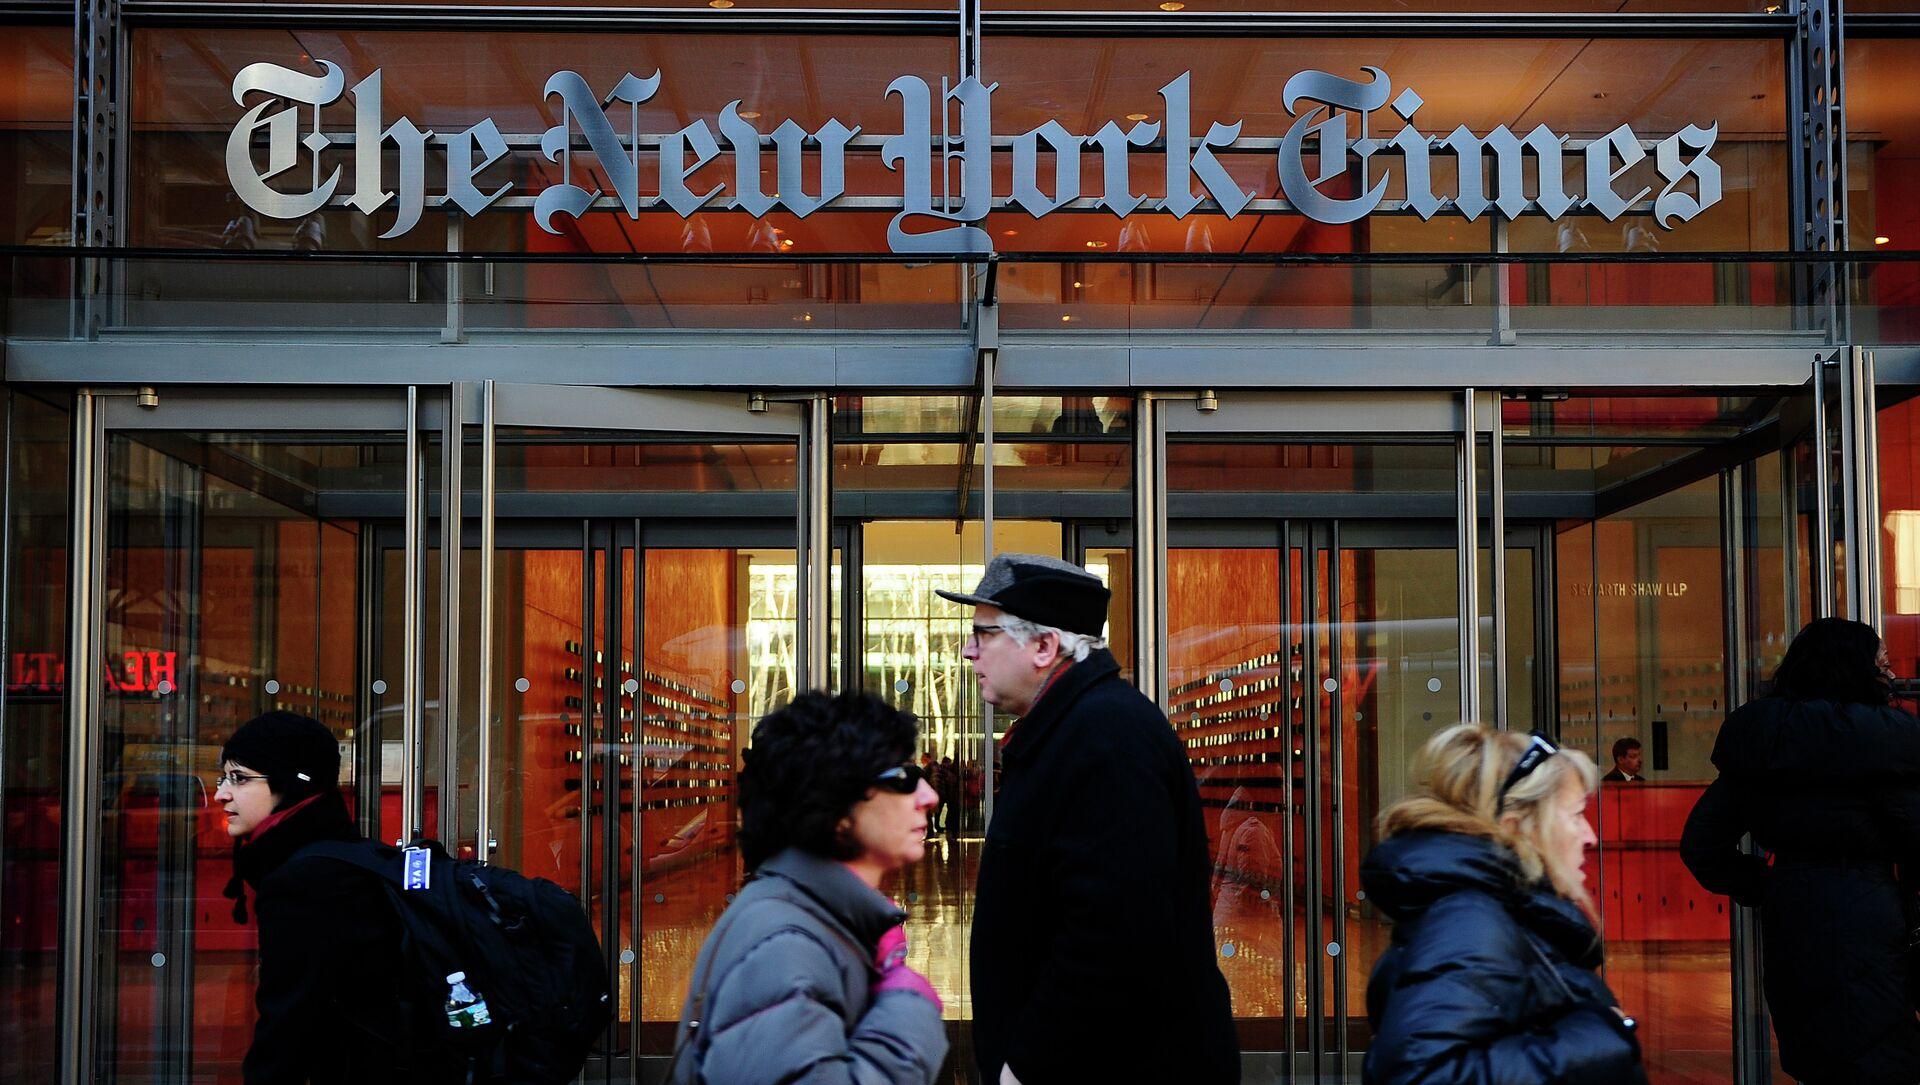 La sede del New York Times a New York - Sputnik Italia, 1920, 26.03.2021